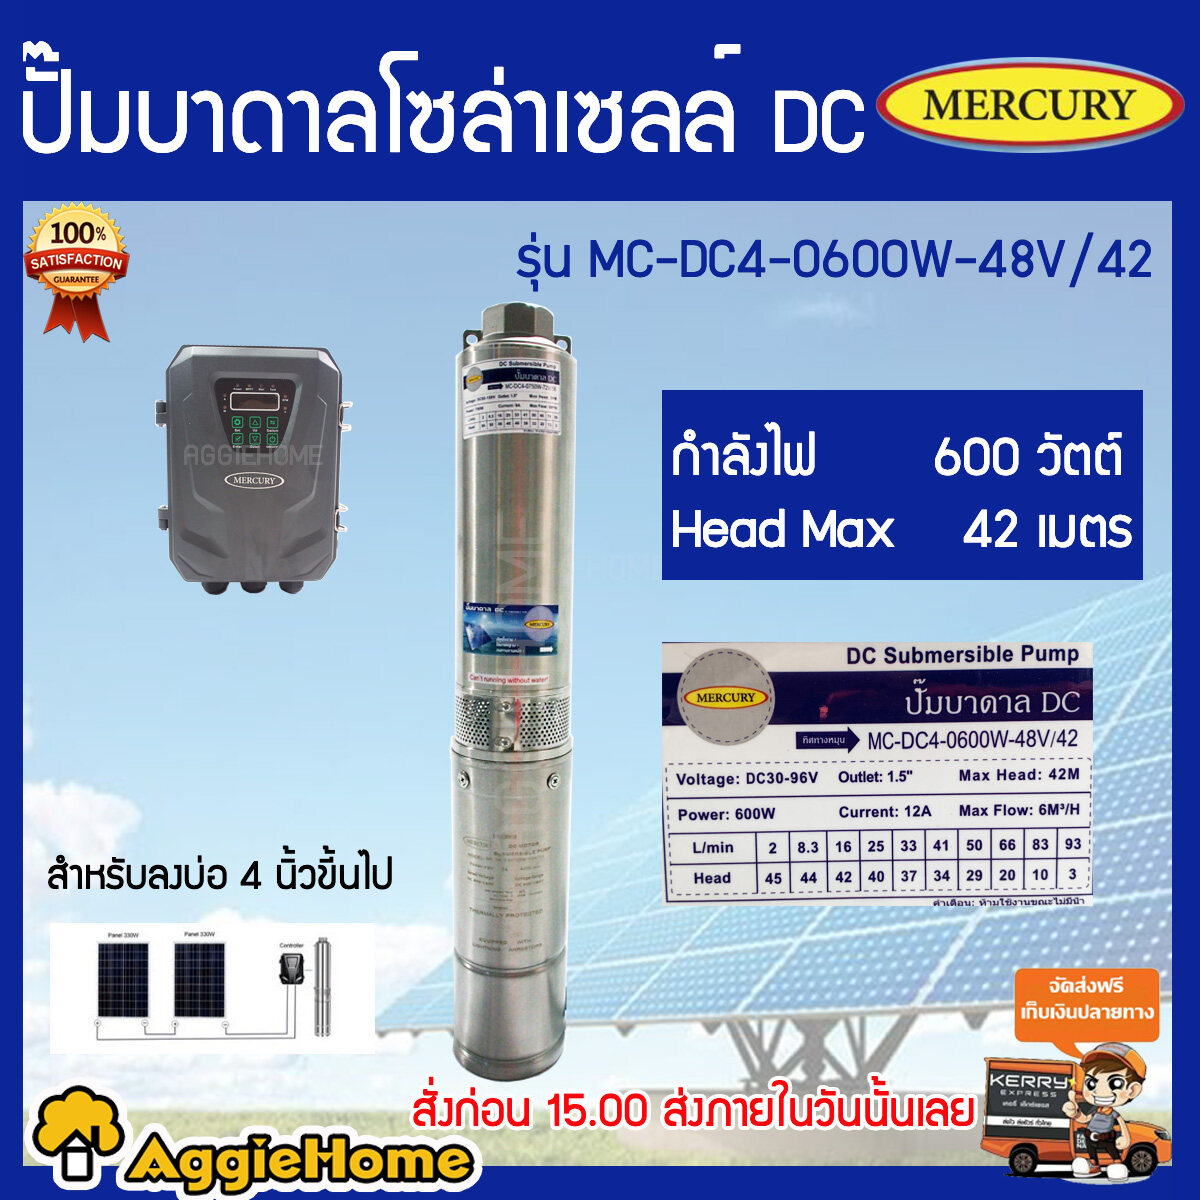 MERCURY ปั้มบาดาล DC600วัตต์ ลงบ่อ 4 นิ้ว รุ่น MC-DC4-0600W-48V/42 ท่ออก1.5 นิ้ว บัสเลส จัดส่งฟรีKERRY